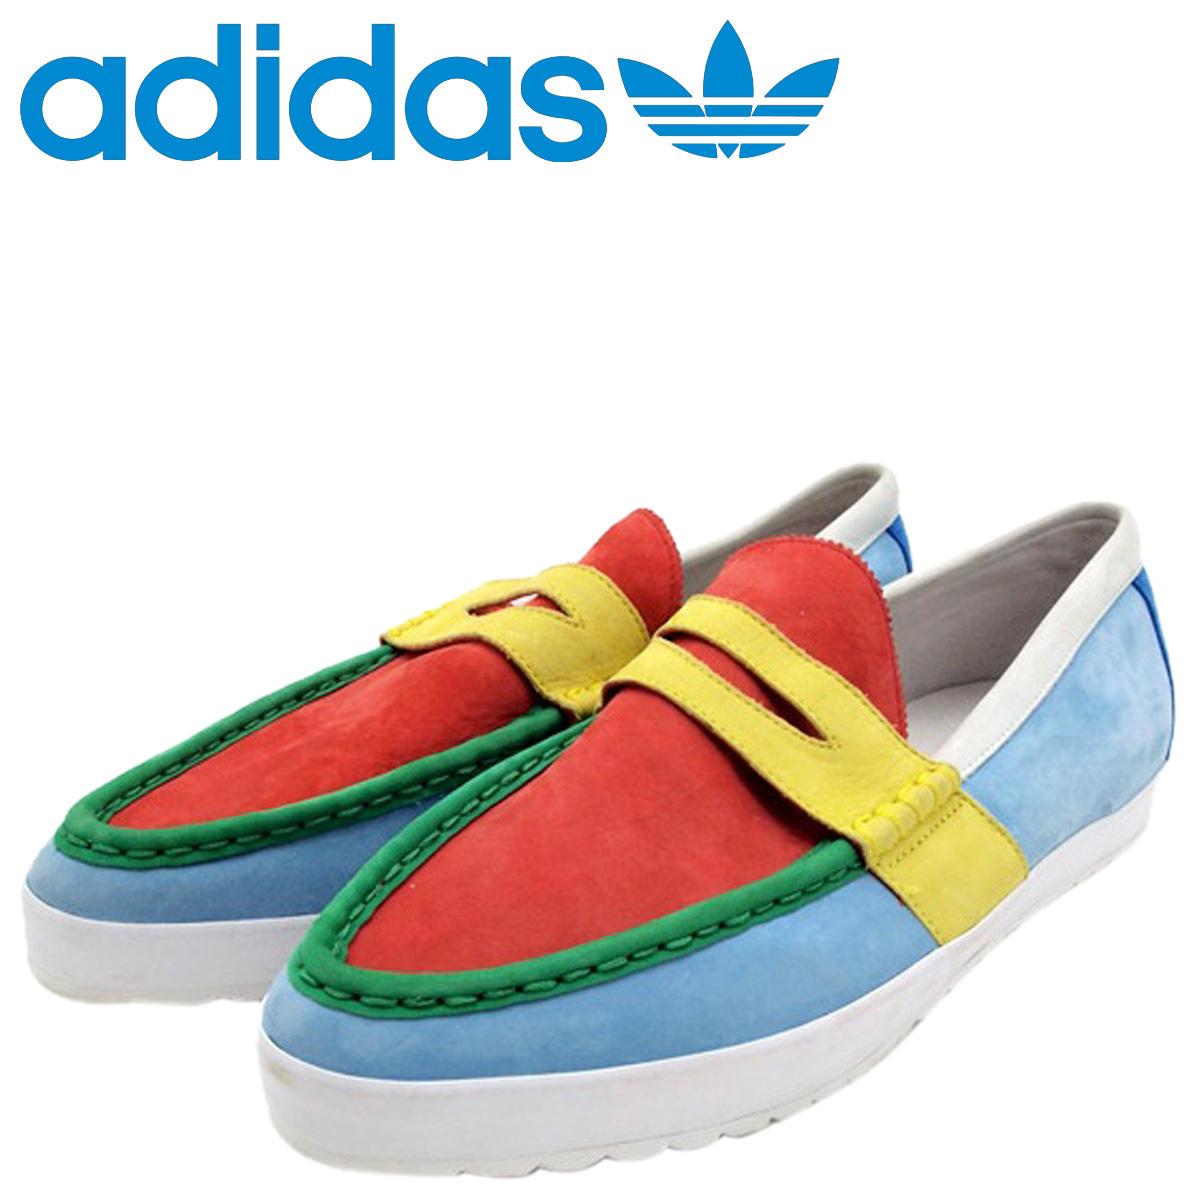 adidas superstar 2, Herren Jeremy Scott Adidas Penny Loafer